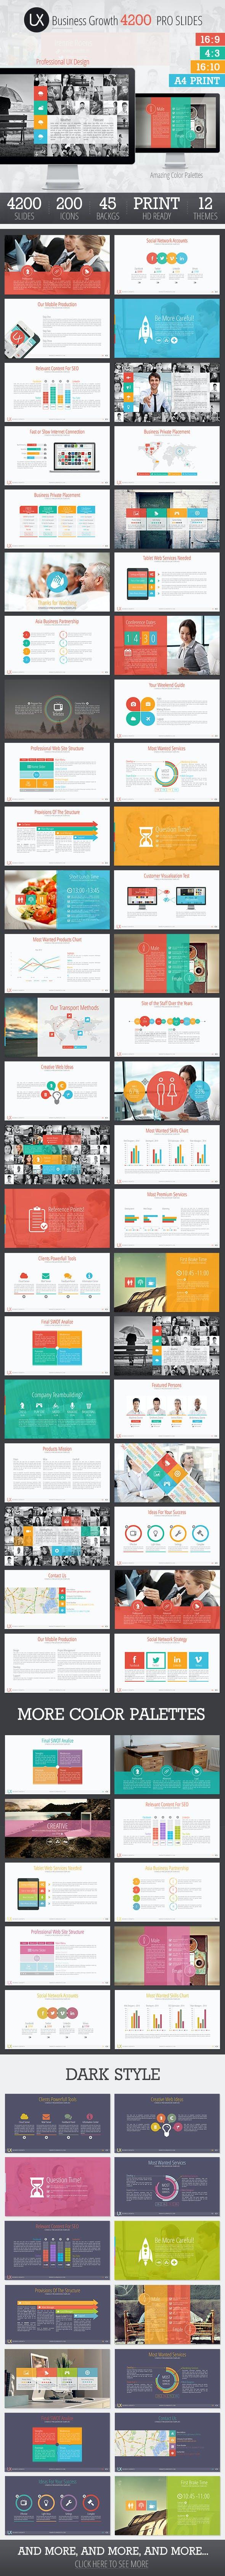 ux design presentation template by bandidos graphicriver